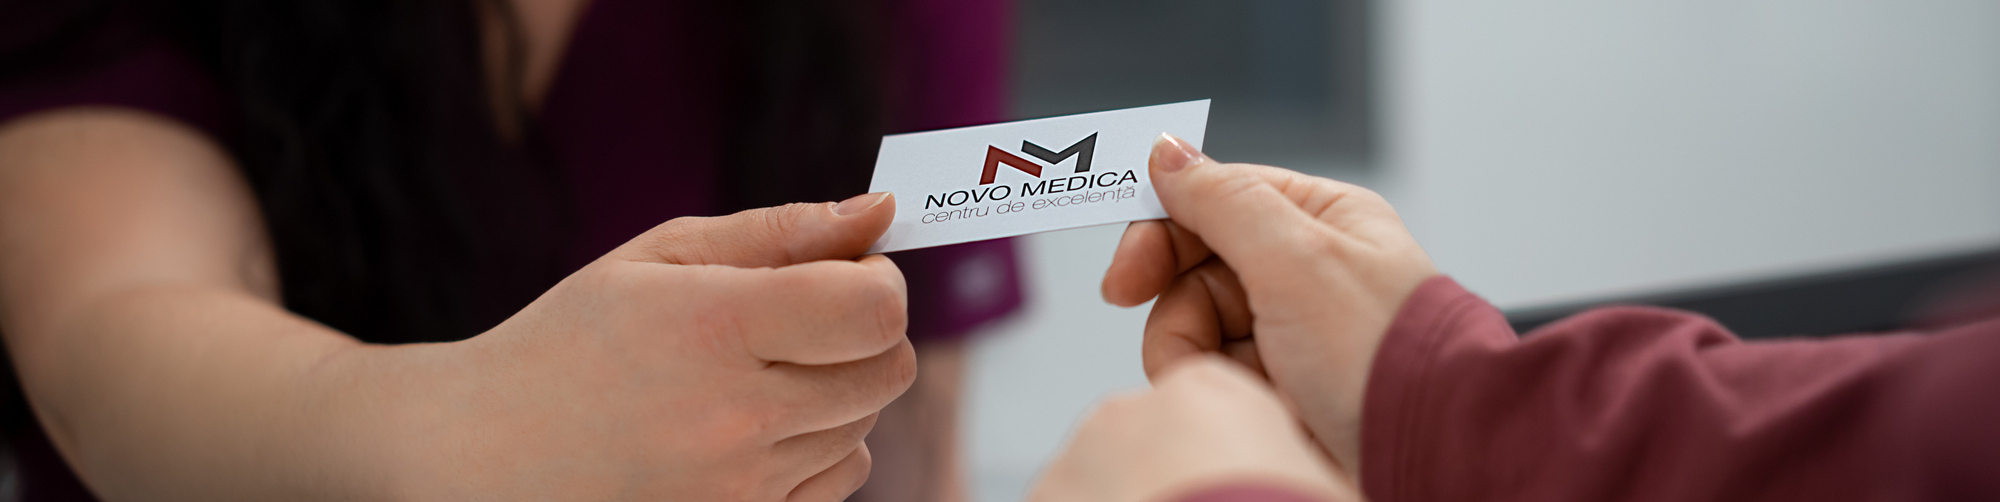 Novo Medica